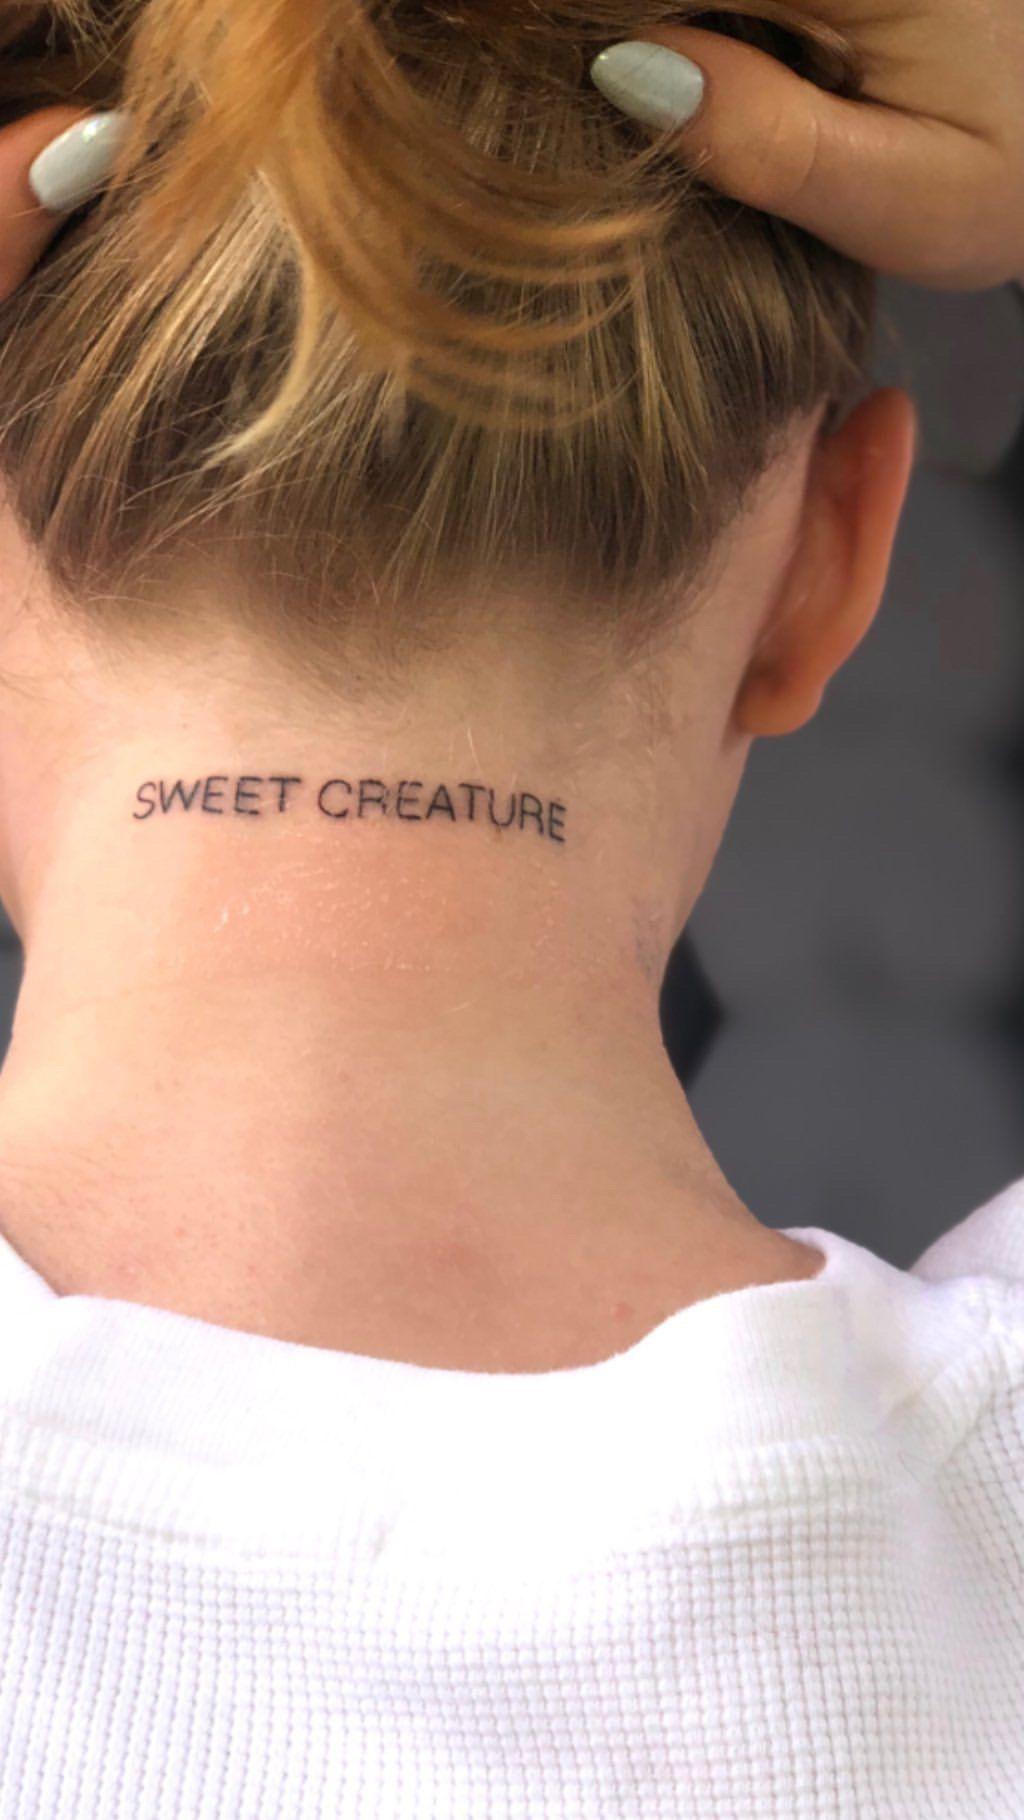 harry styles sweet creature tattoo